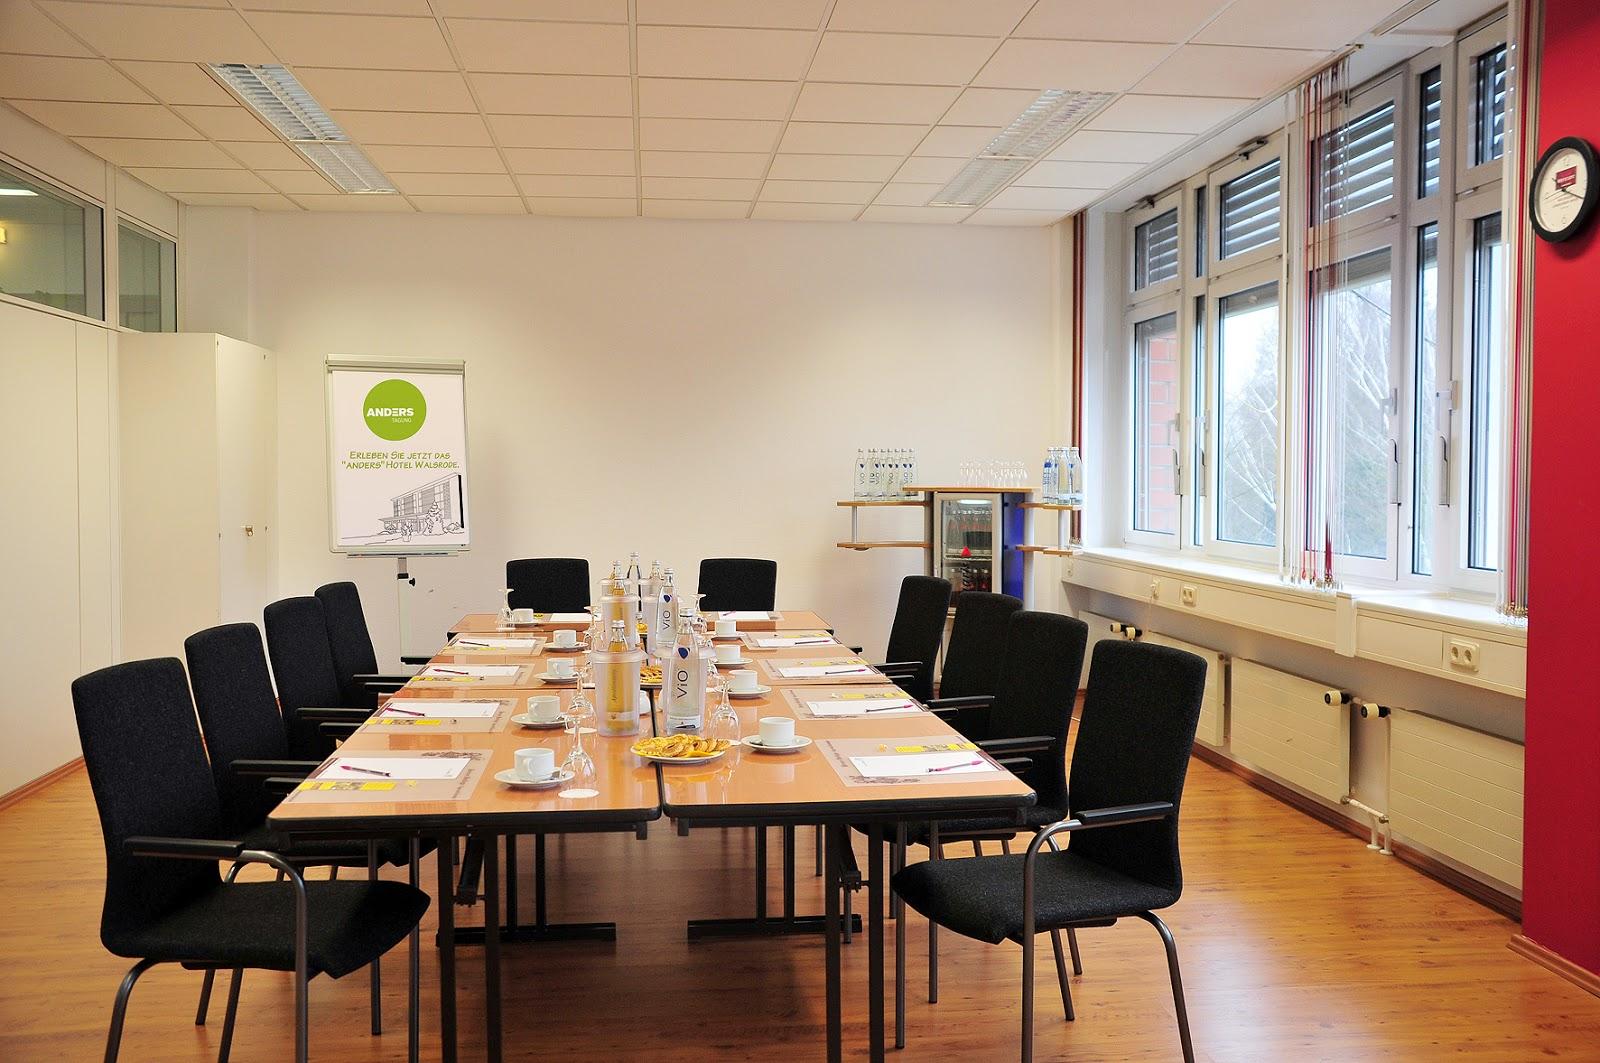 Conference Center Walsrode: Mapa - Alemanha - Mapcarta